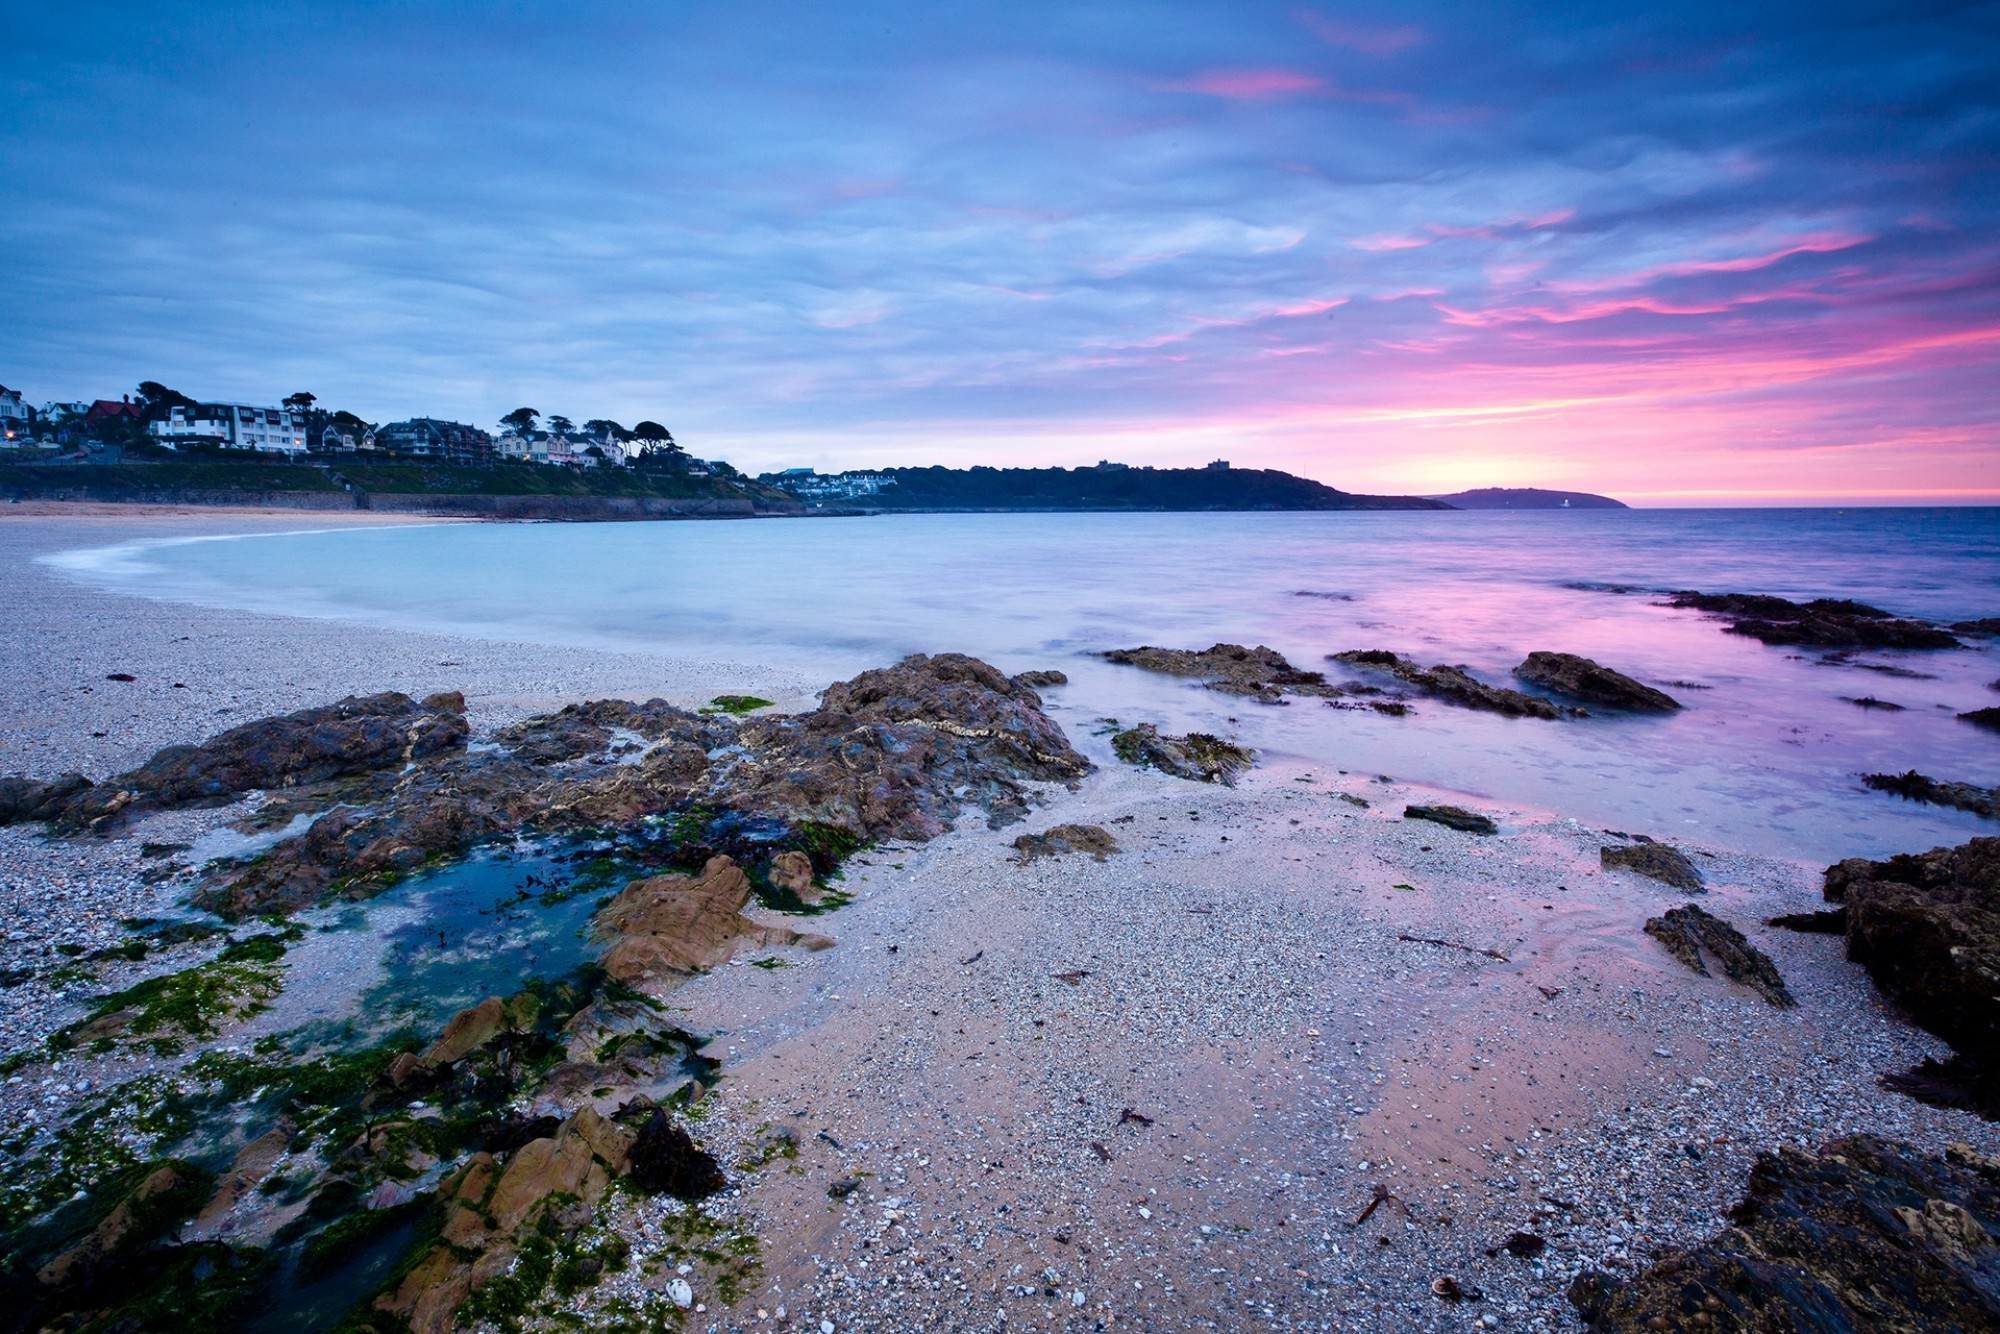 Sunrise-on-Gyllyngvase-Beach-Falmouth-Cornwall-England-UK